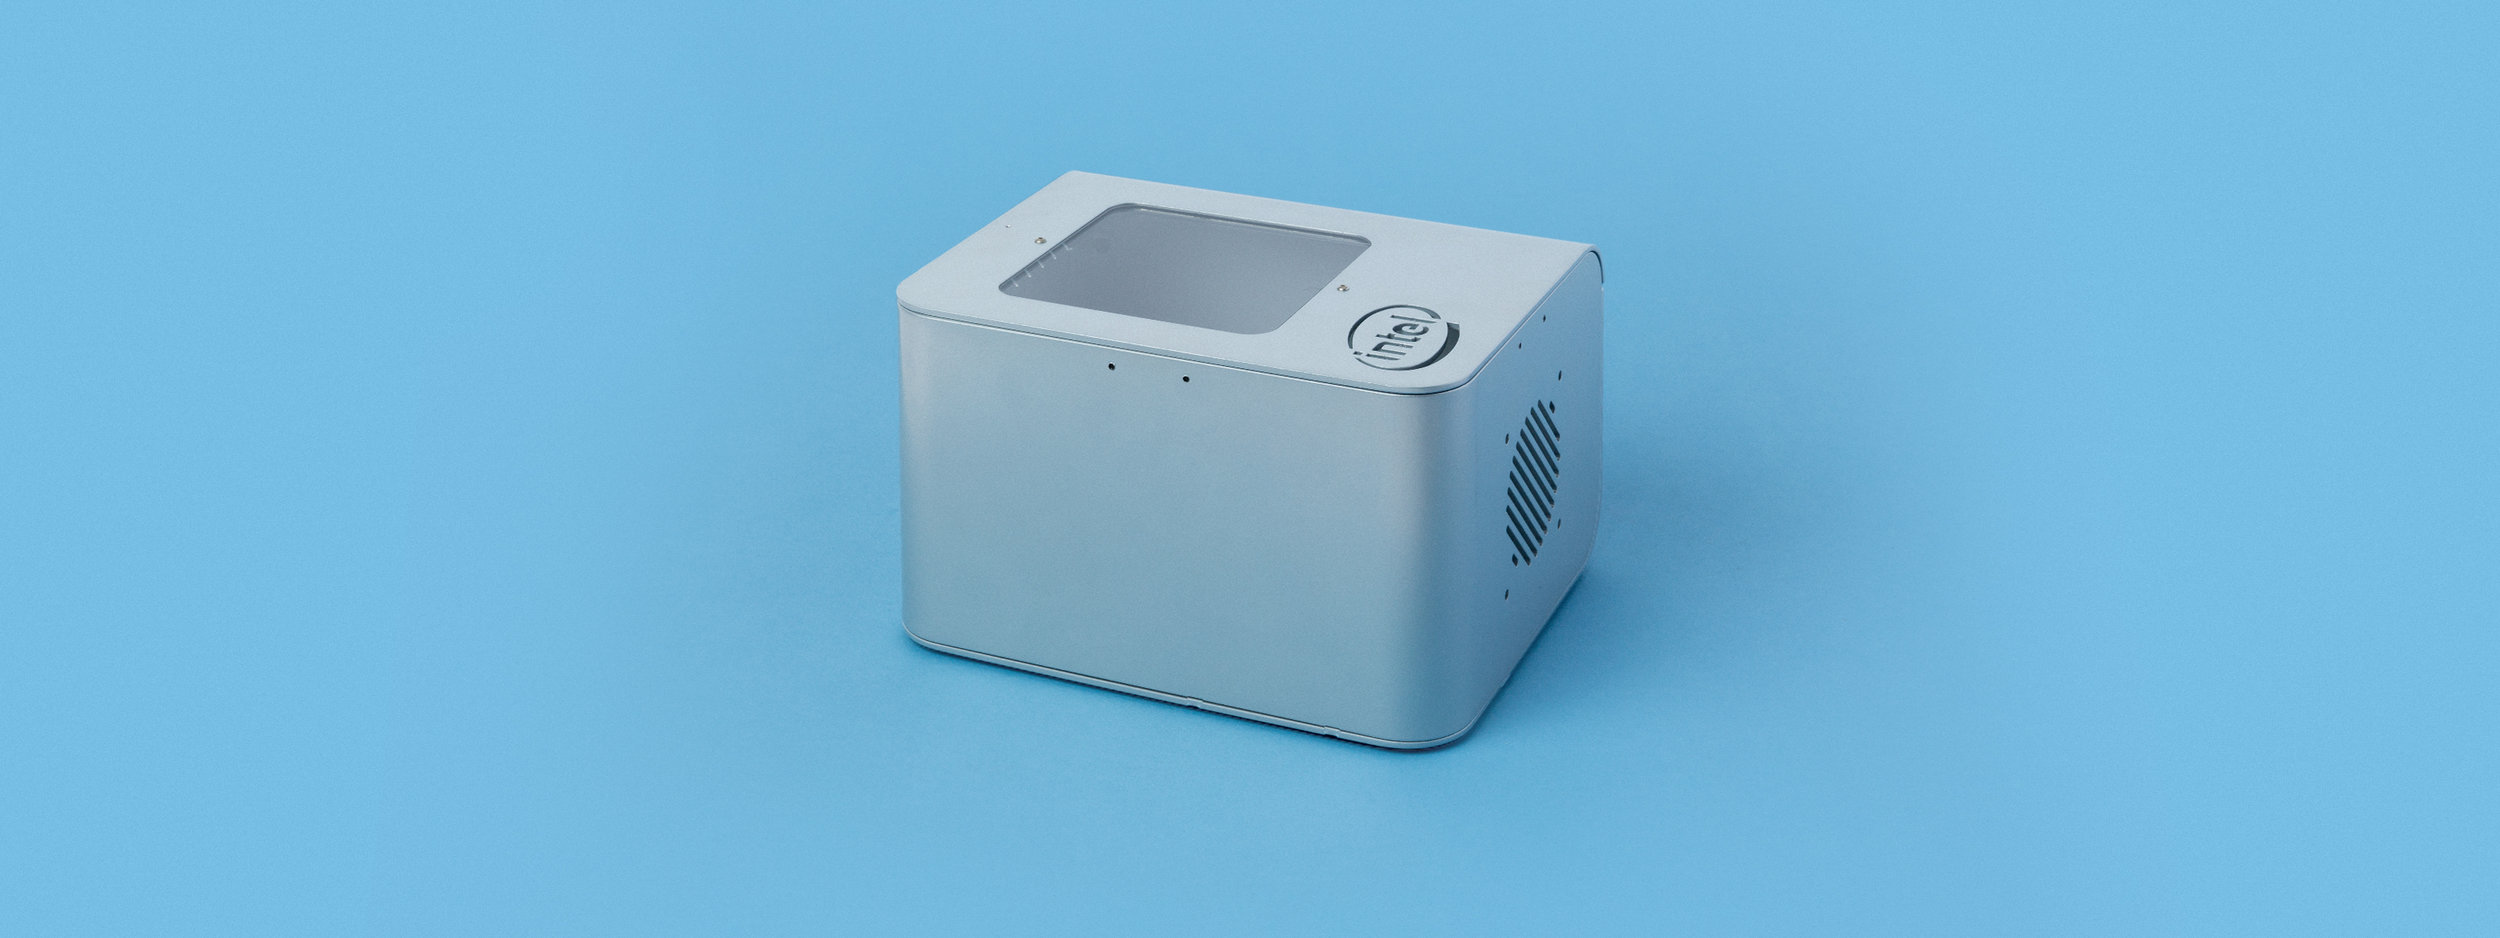 laser cut, laser cutting, intel, custom box, magnetic lid, powder coat